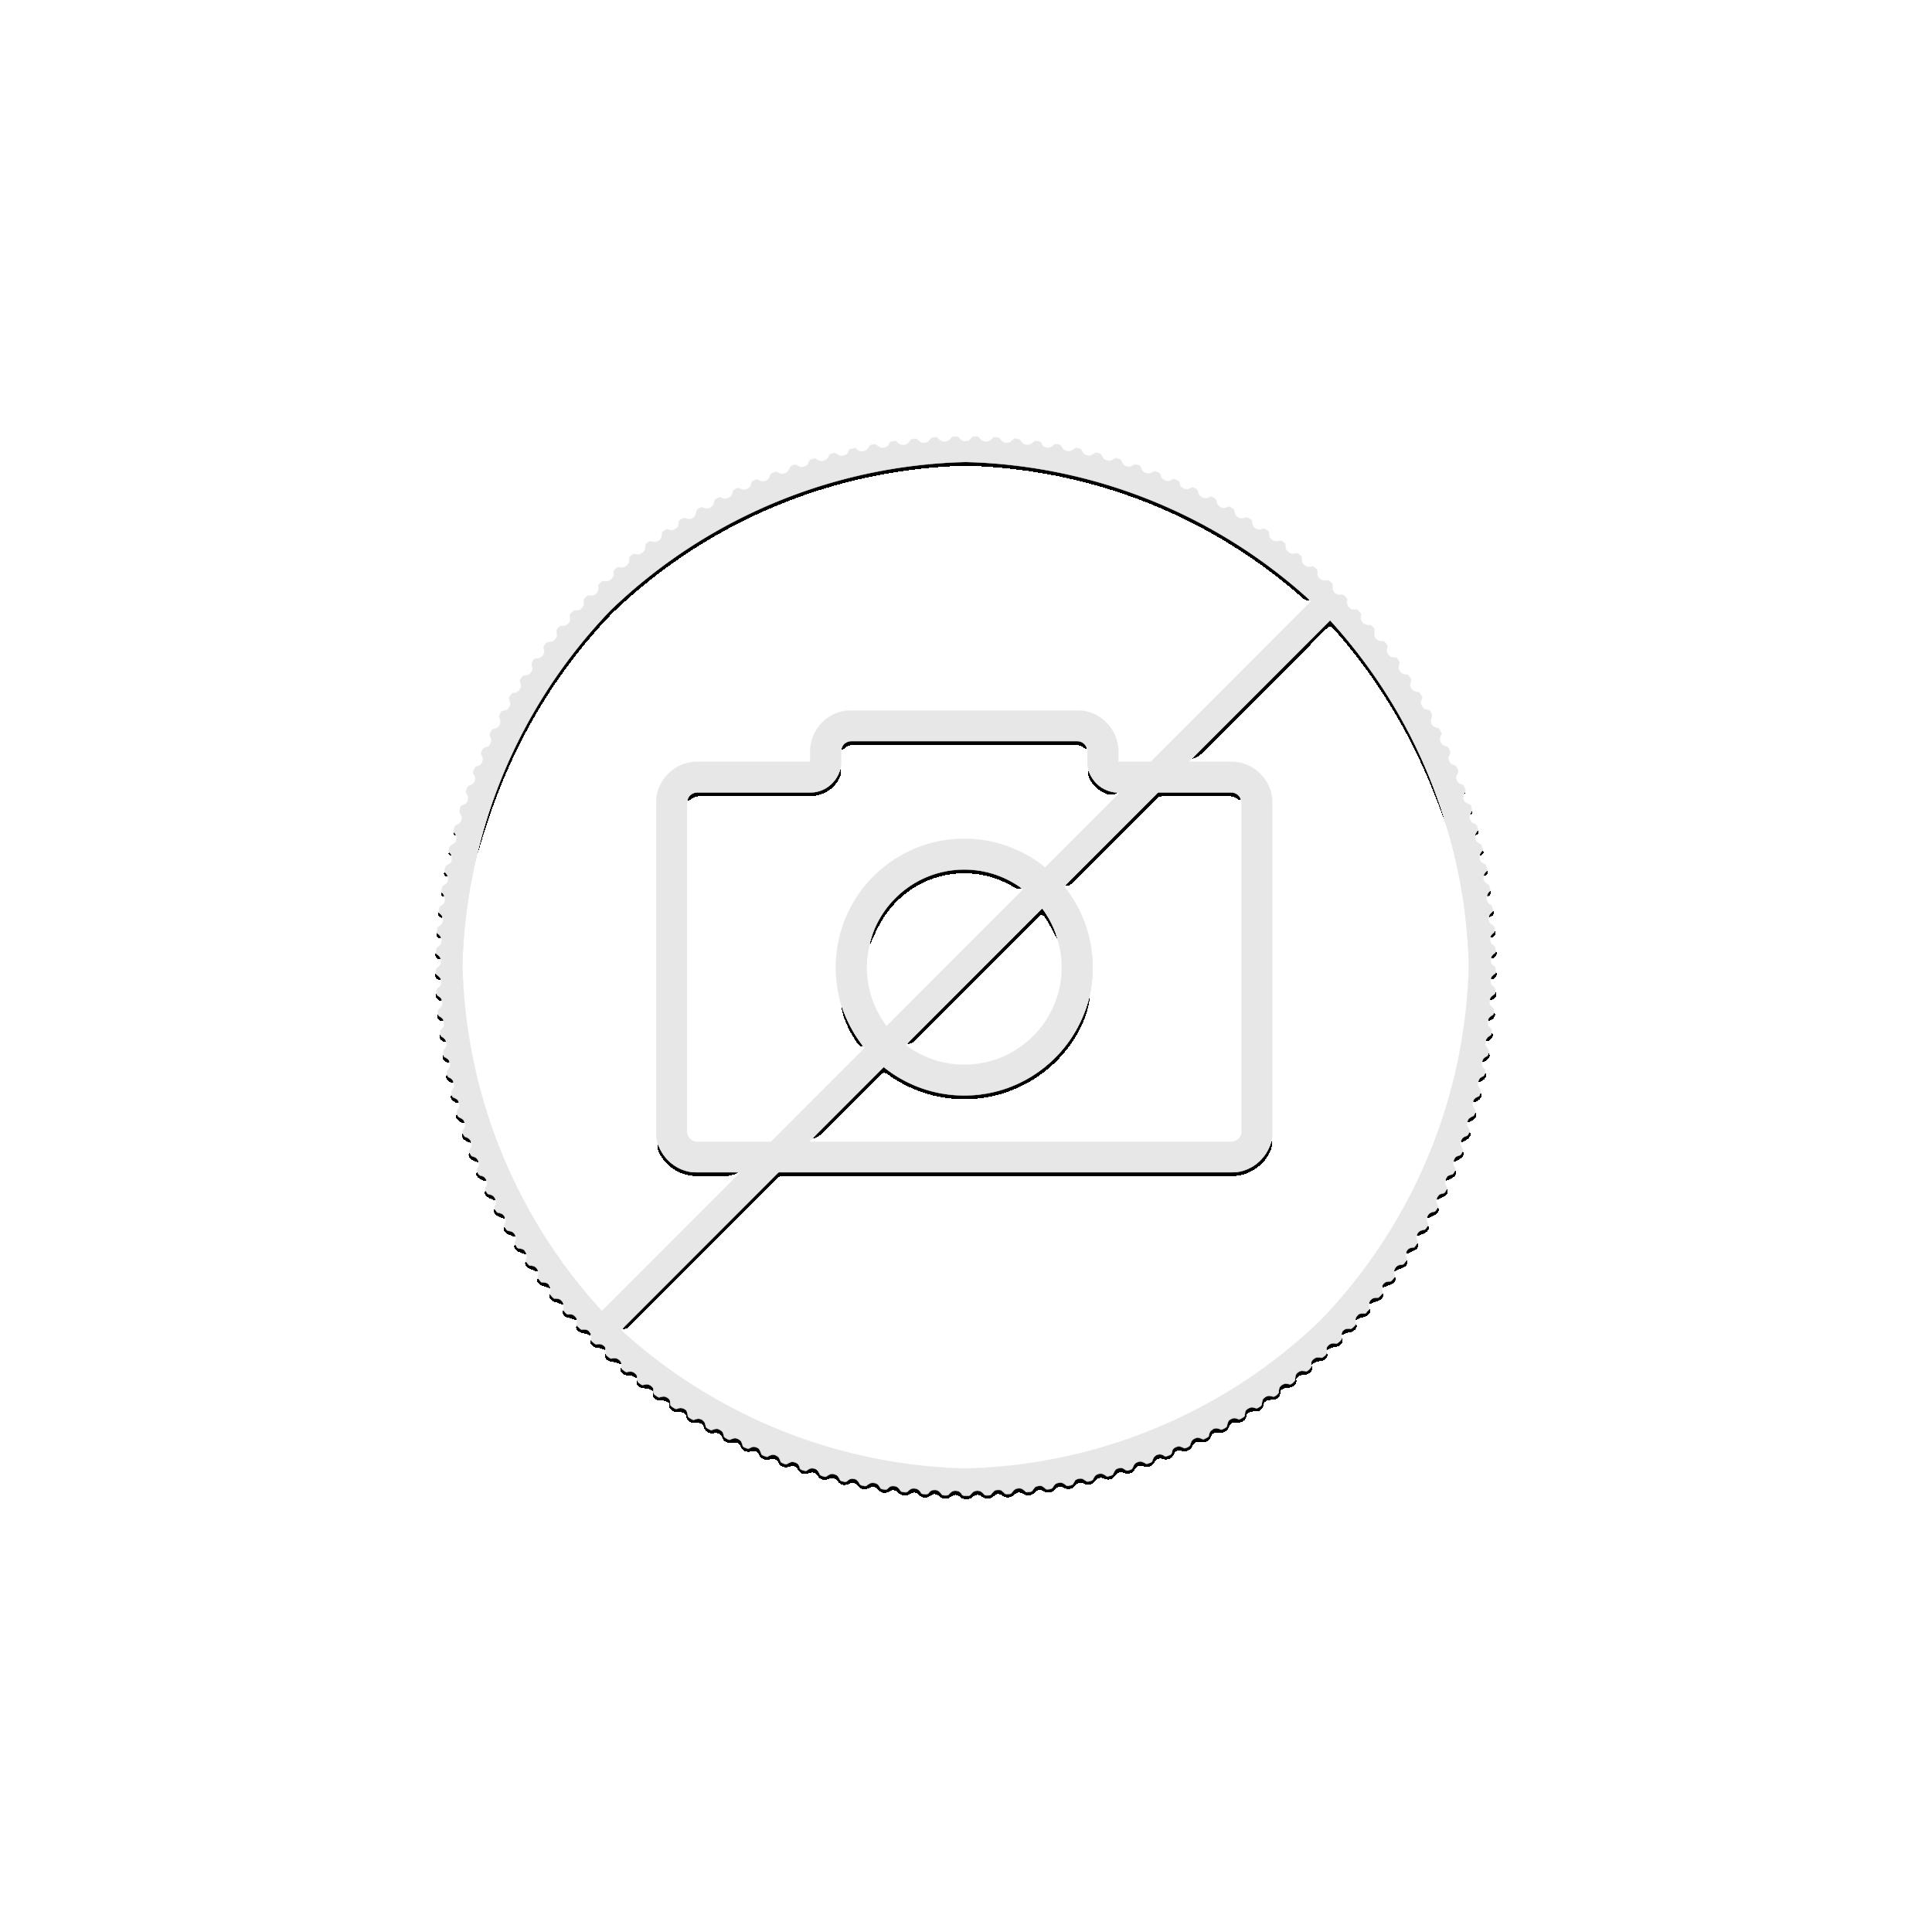 2 troy ounce silver coin Samoa Avalokitesvara Piedfort - antique finish 2020